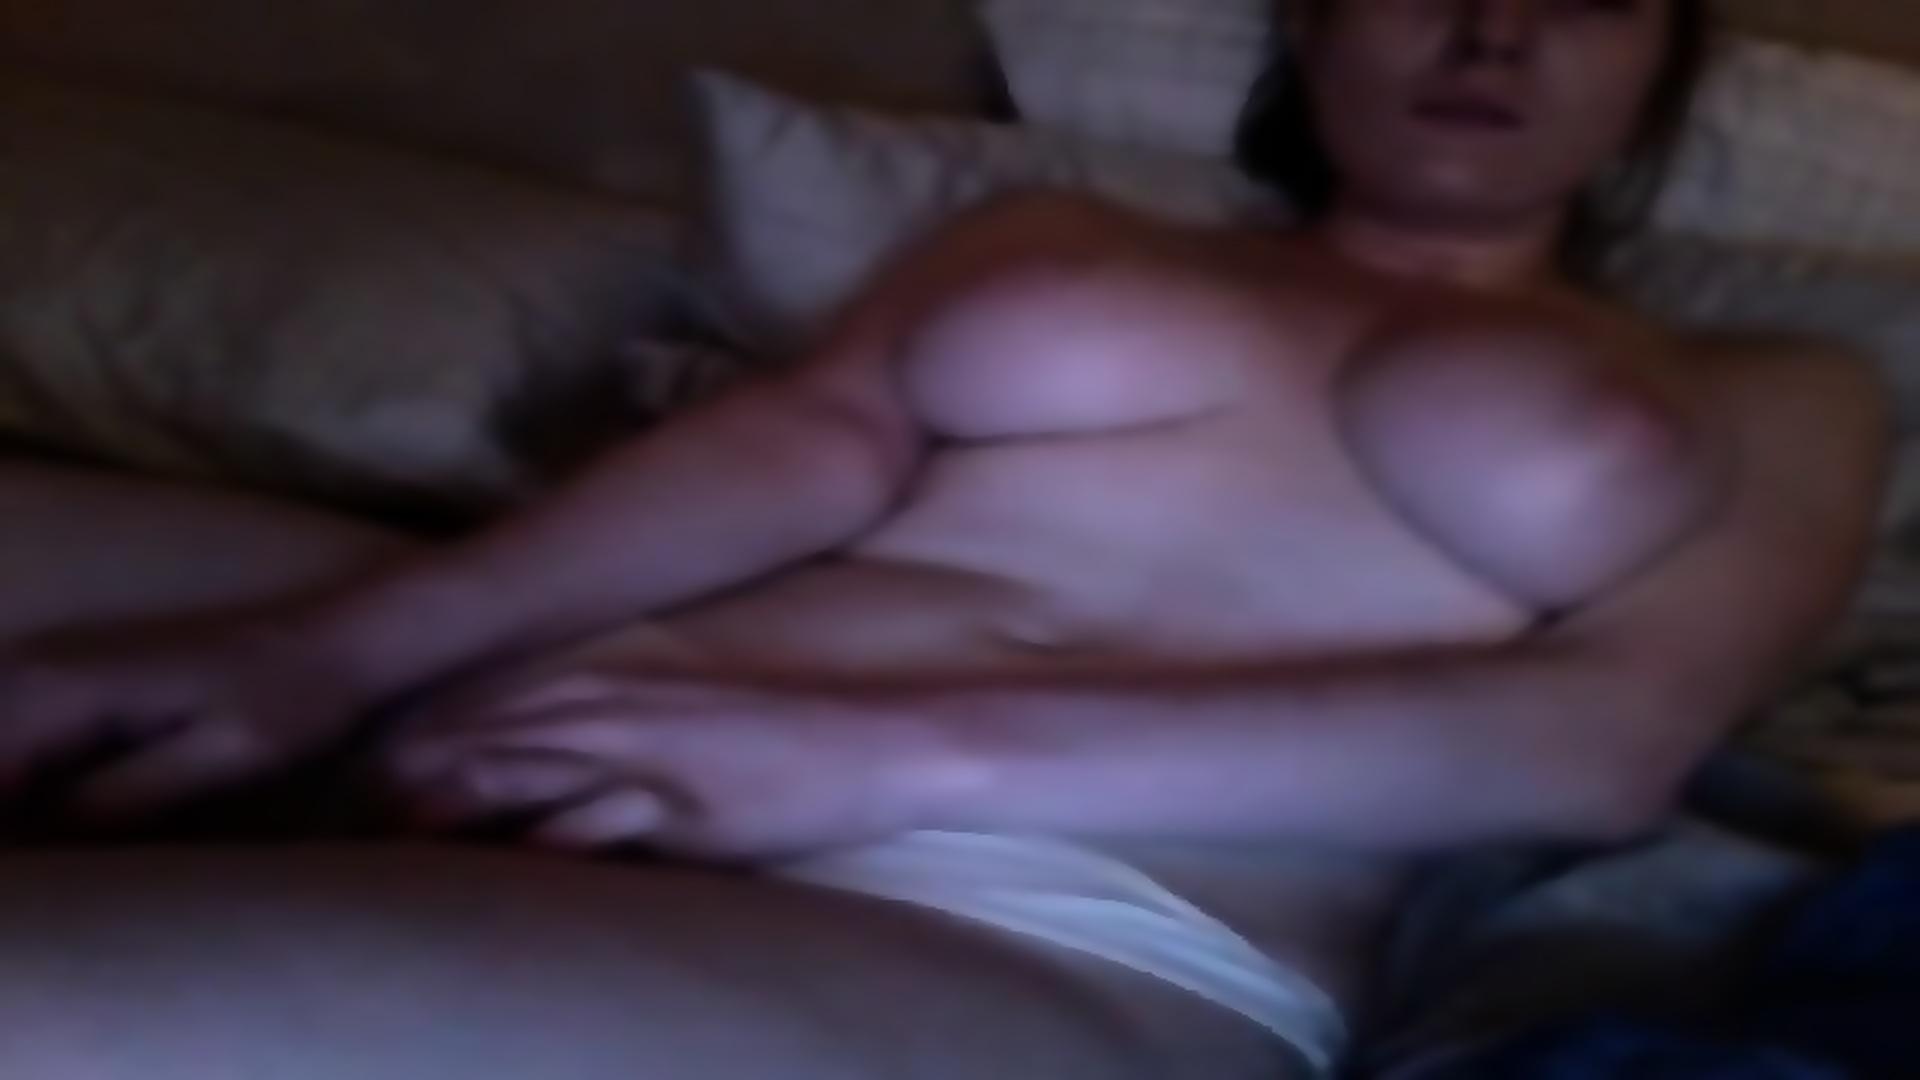 Cartoni porno sex hot